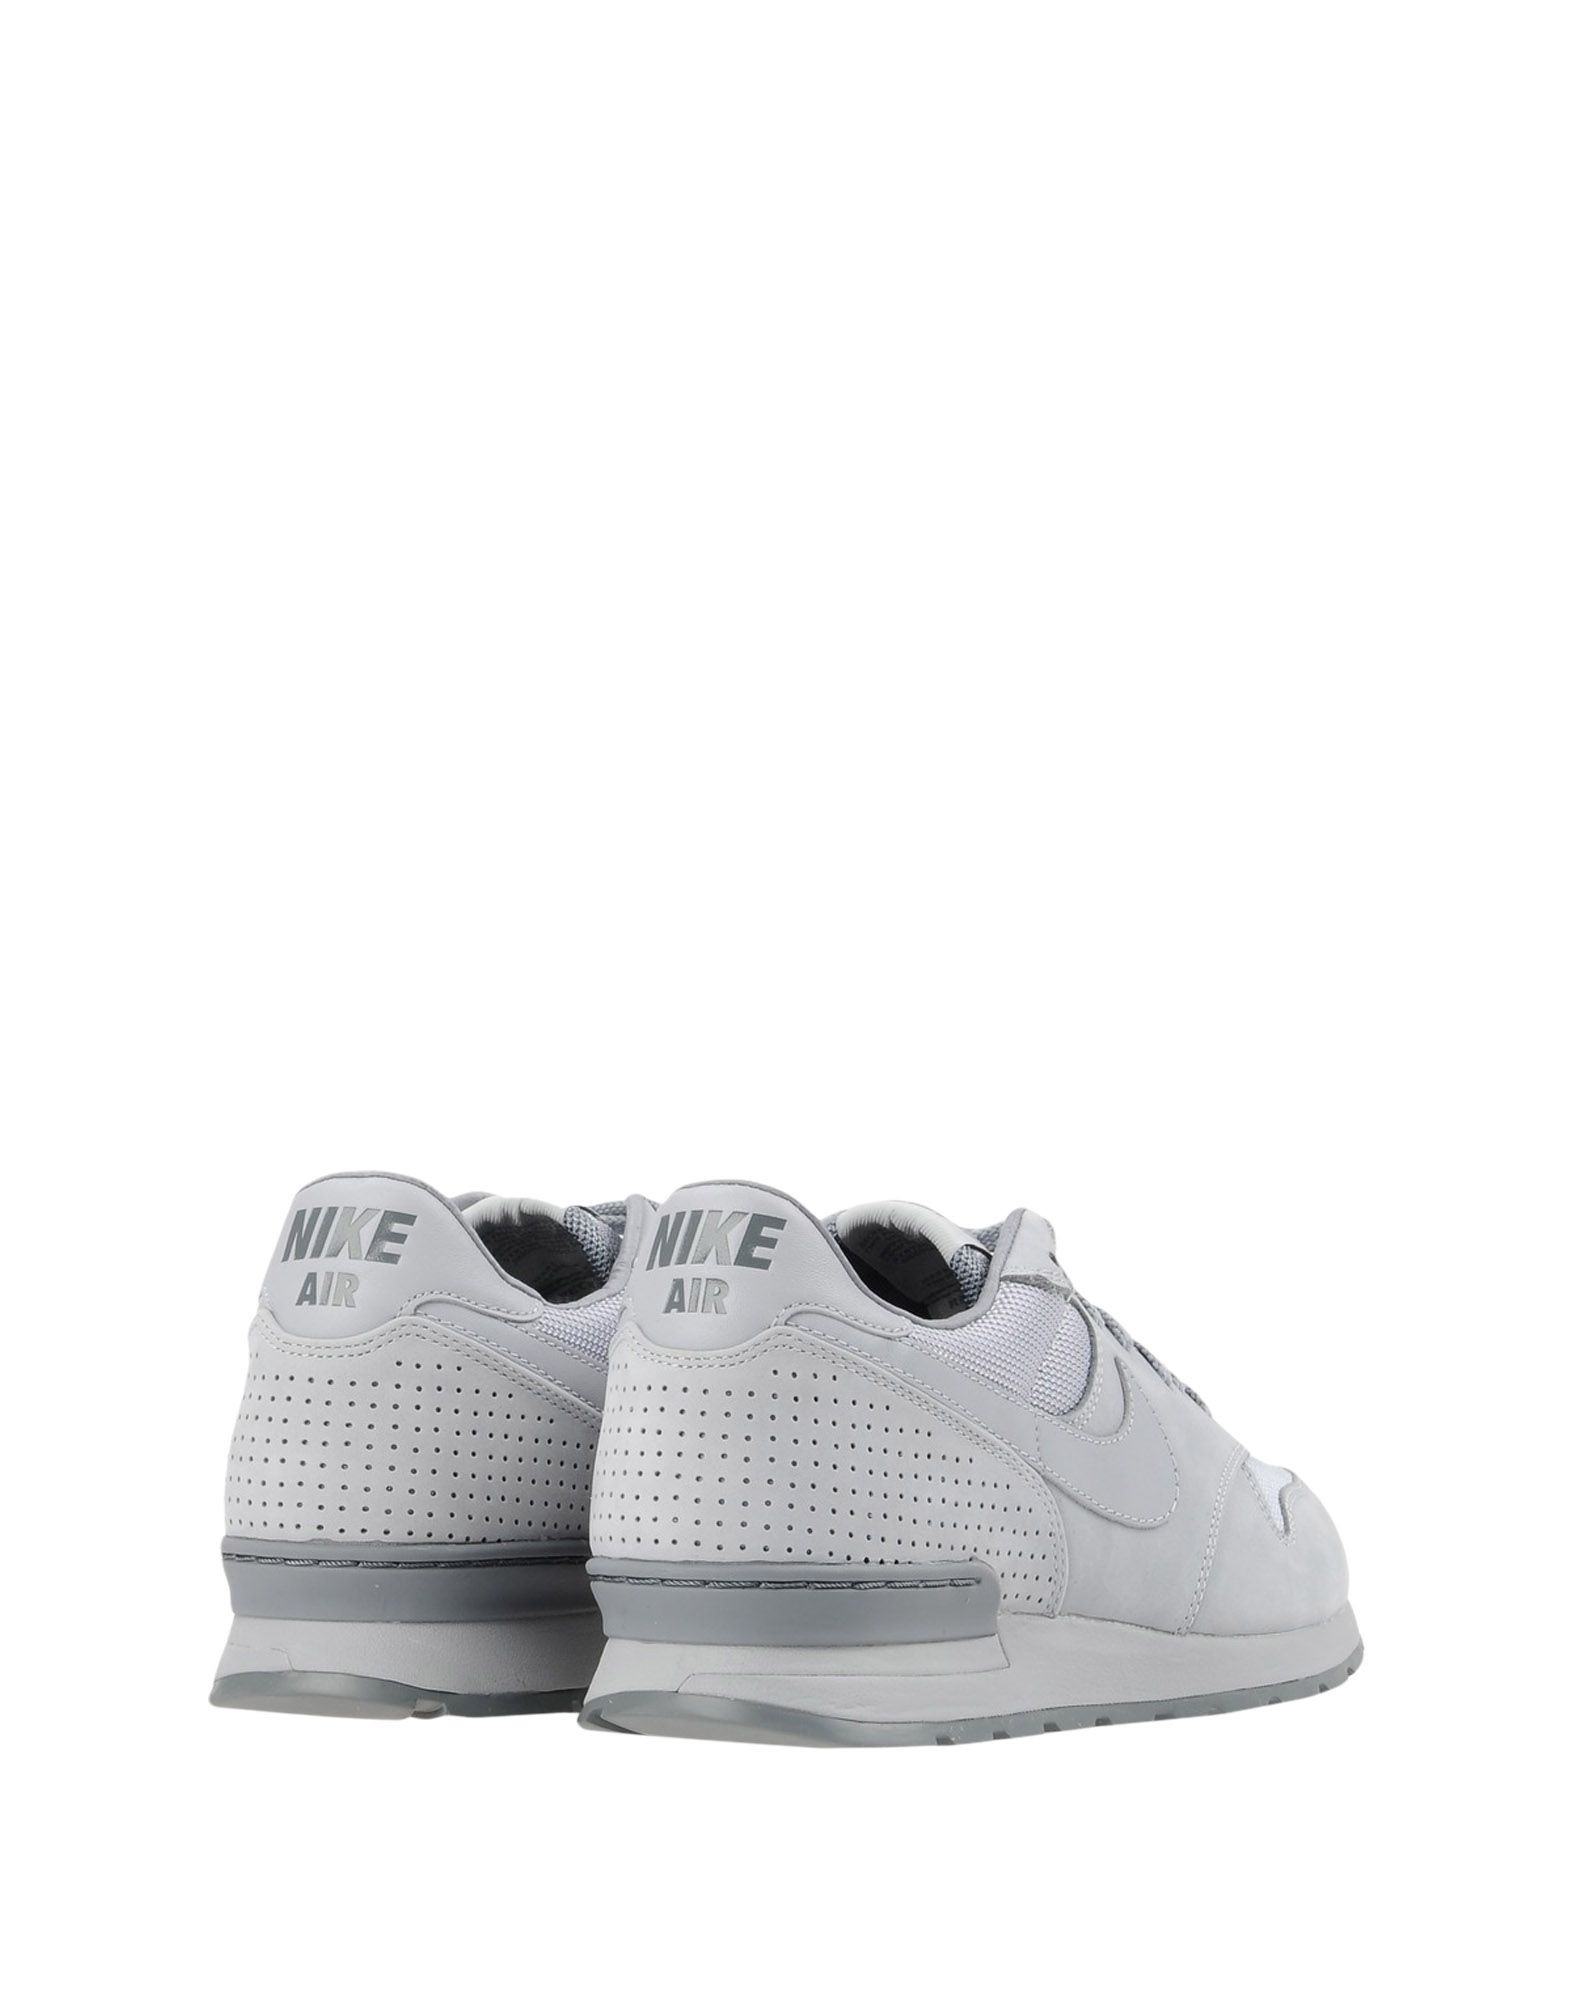 Nike  Air Zoom Epic Luxe  11307217AI Gute Qualität beliebte Schuhe